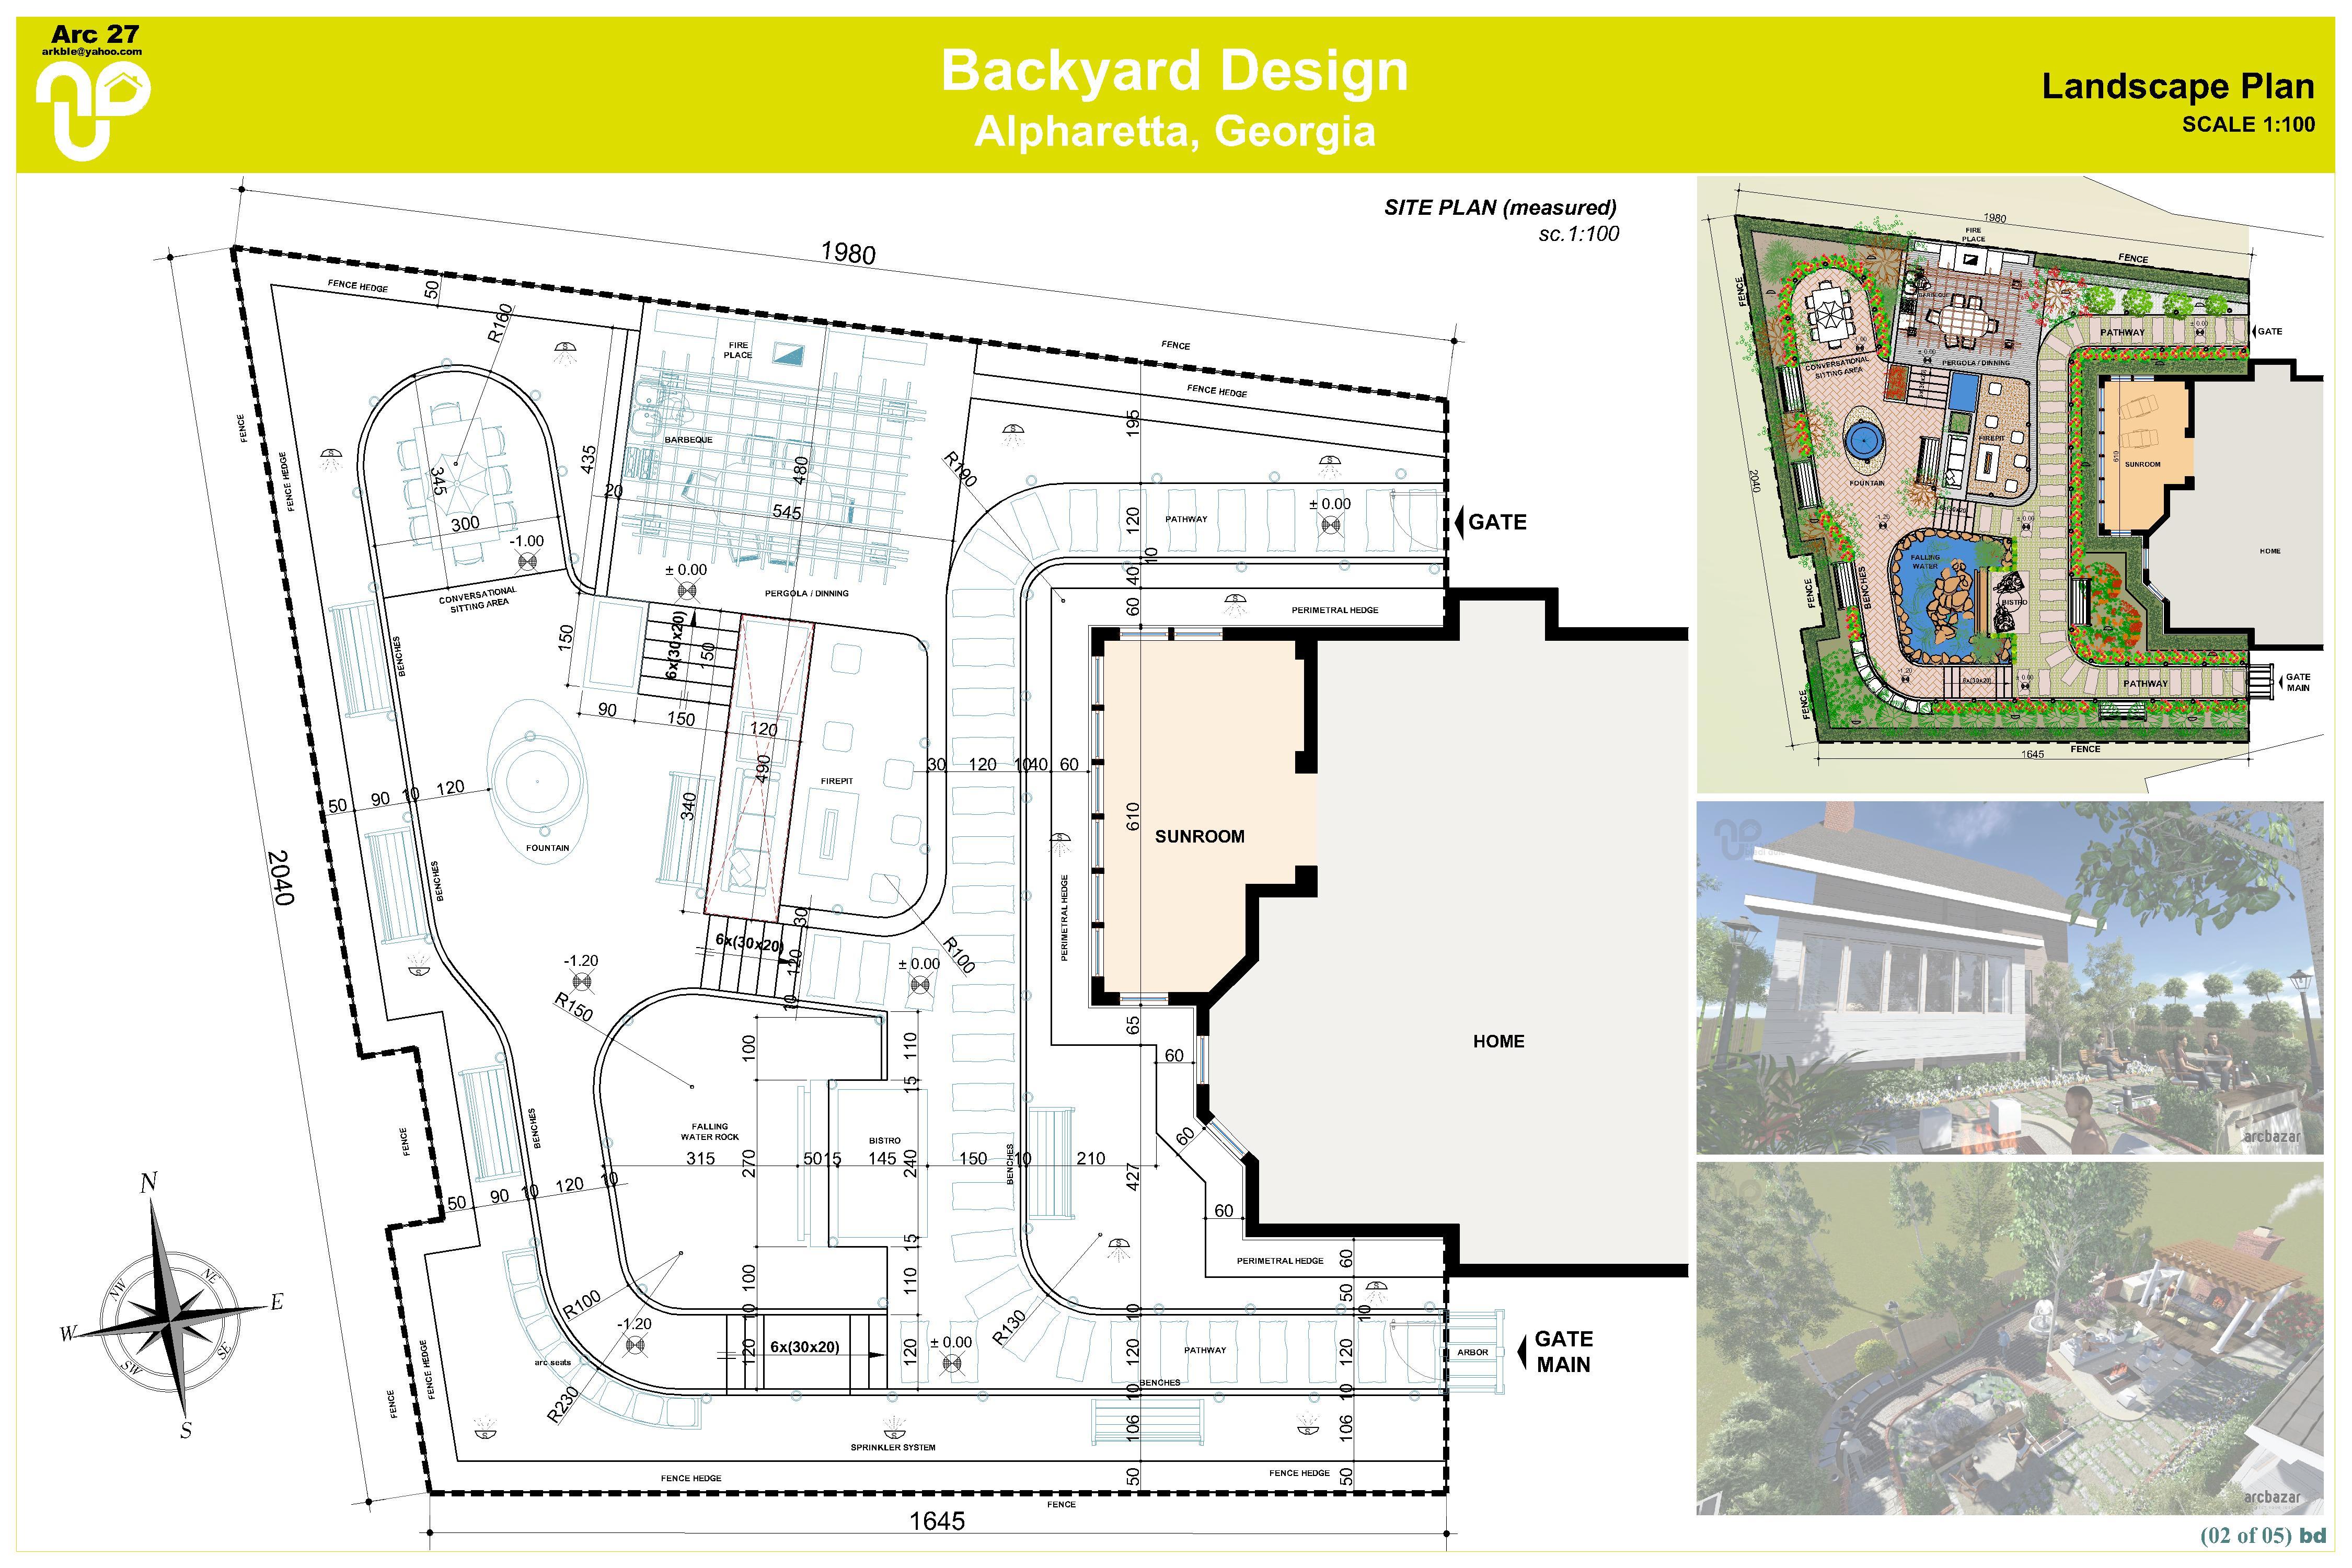 Backyard design designed by a bd architects backyard for Landscape design layout